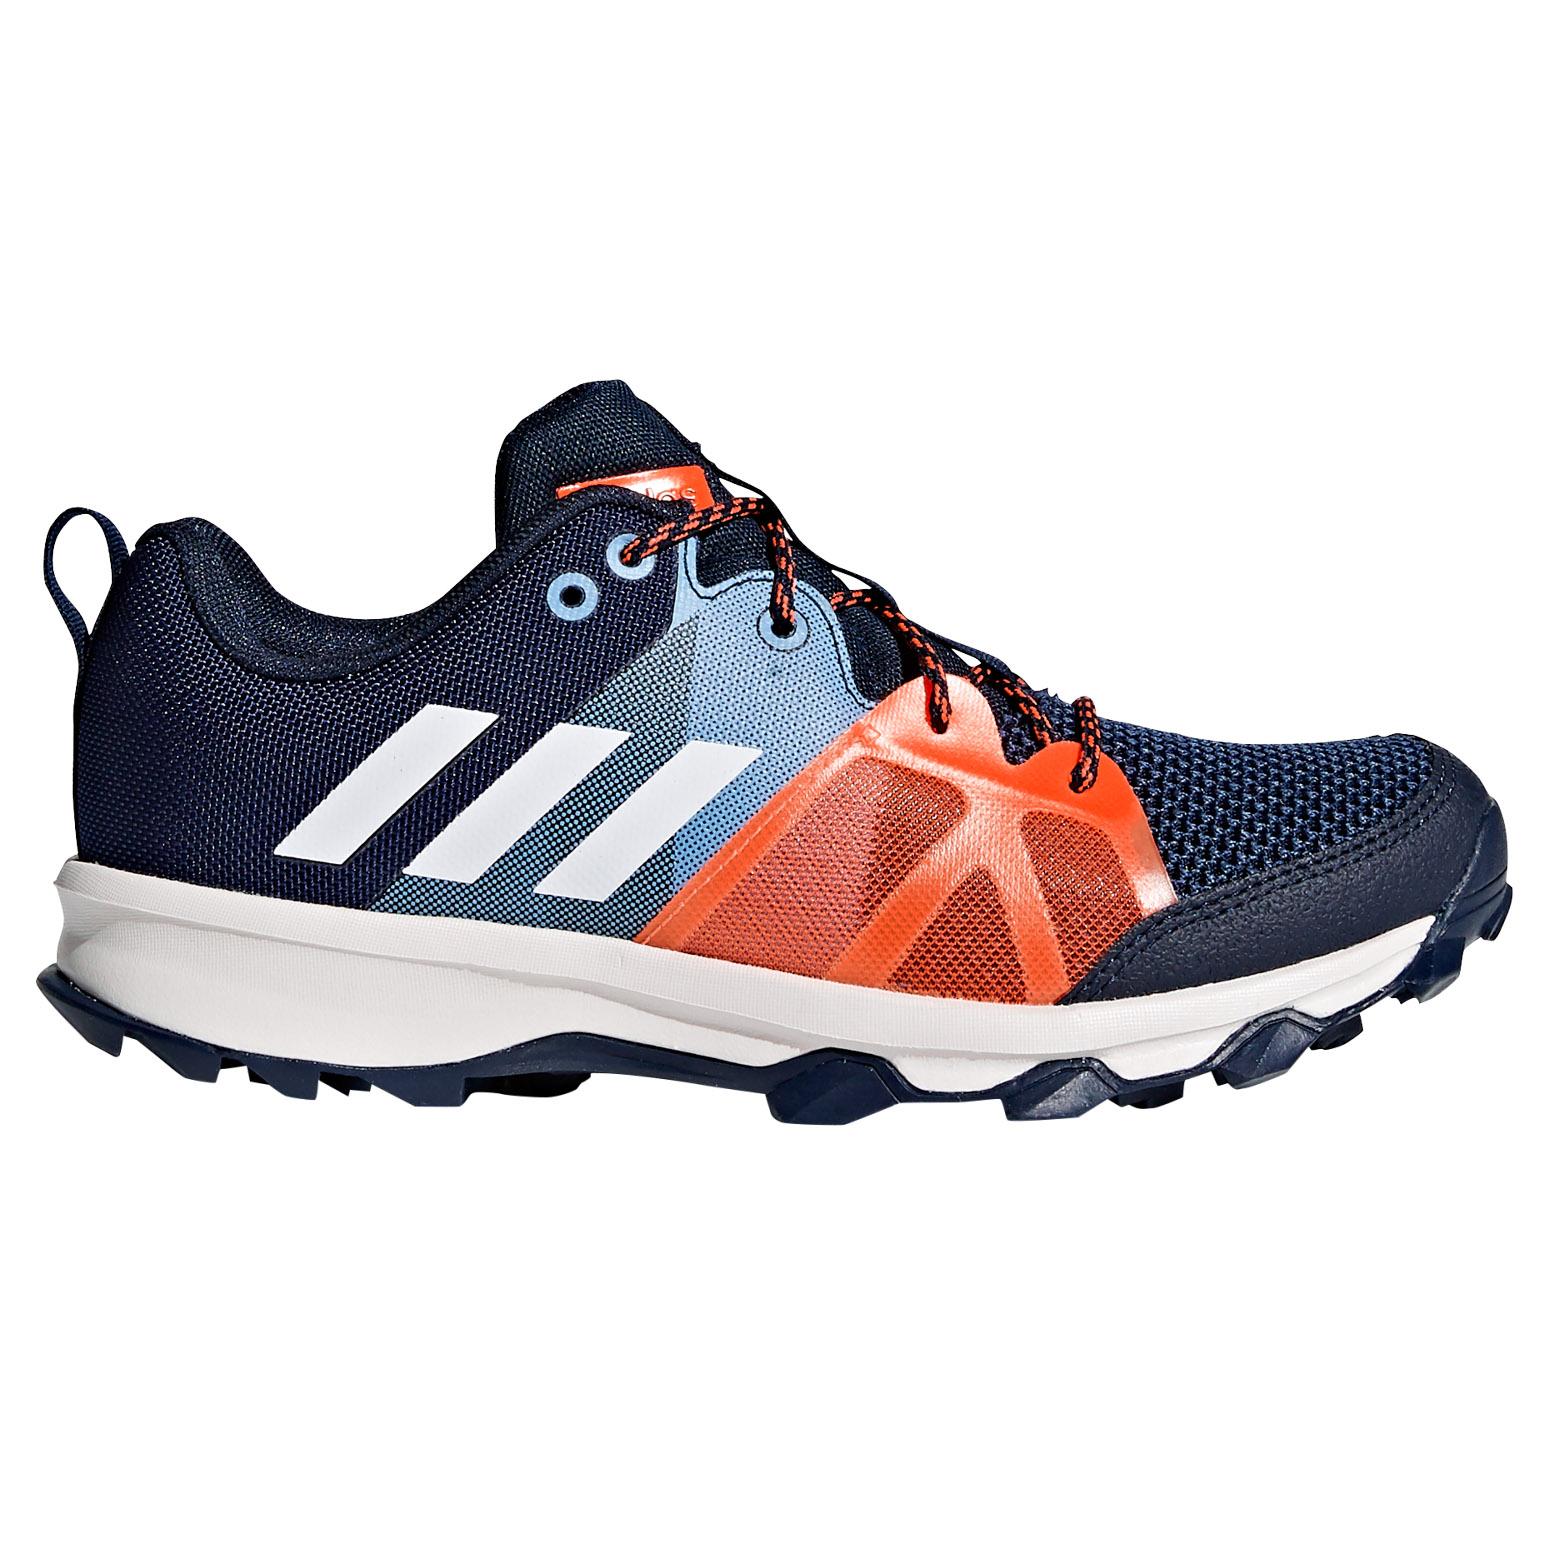 Adidas kanadia Trail kids boys Trainer corriendo Trainer boys zapato azul / naranja 3420ae